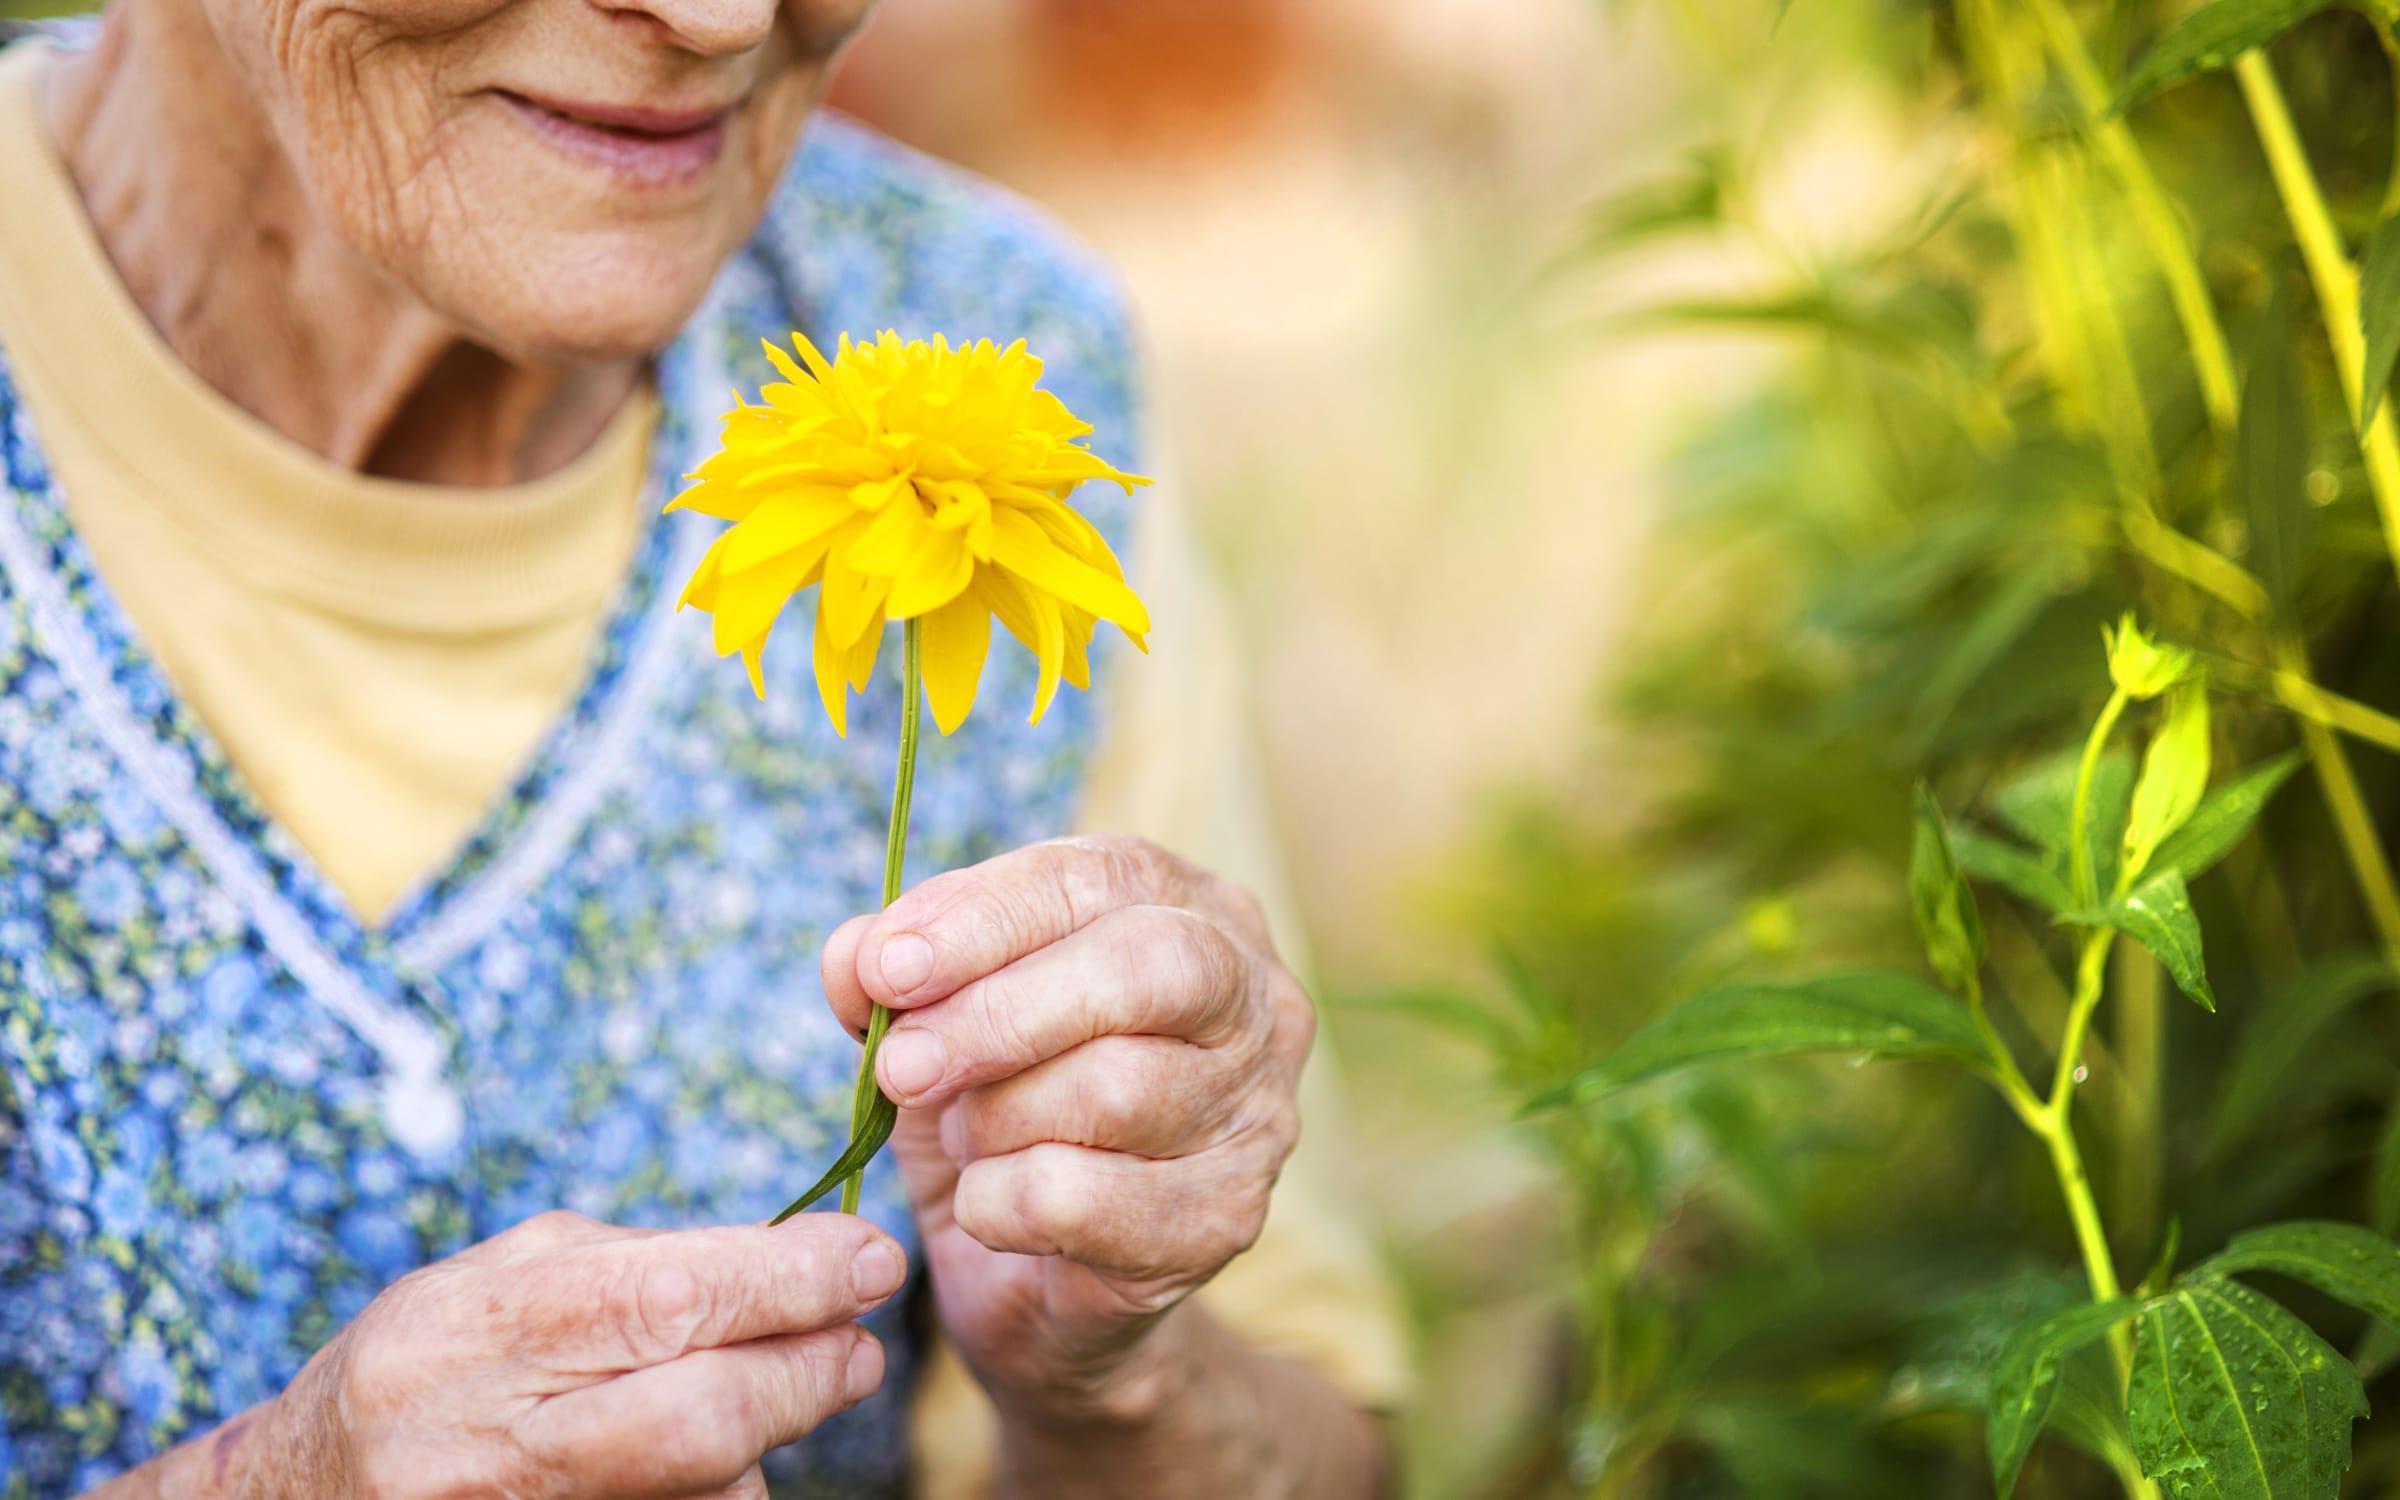 A Holistic Approach to Health and Wellness